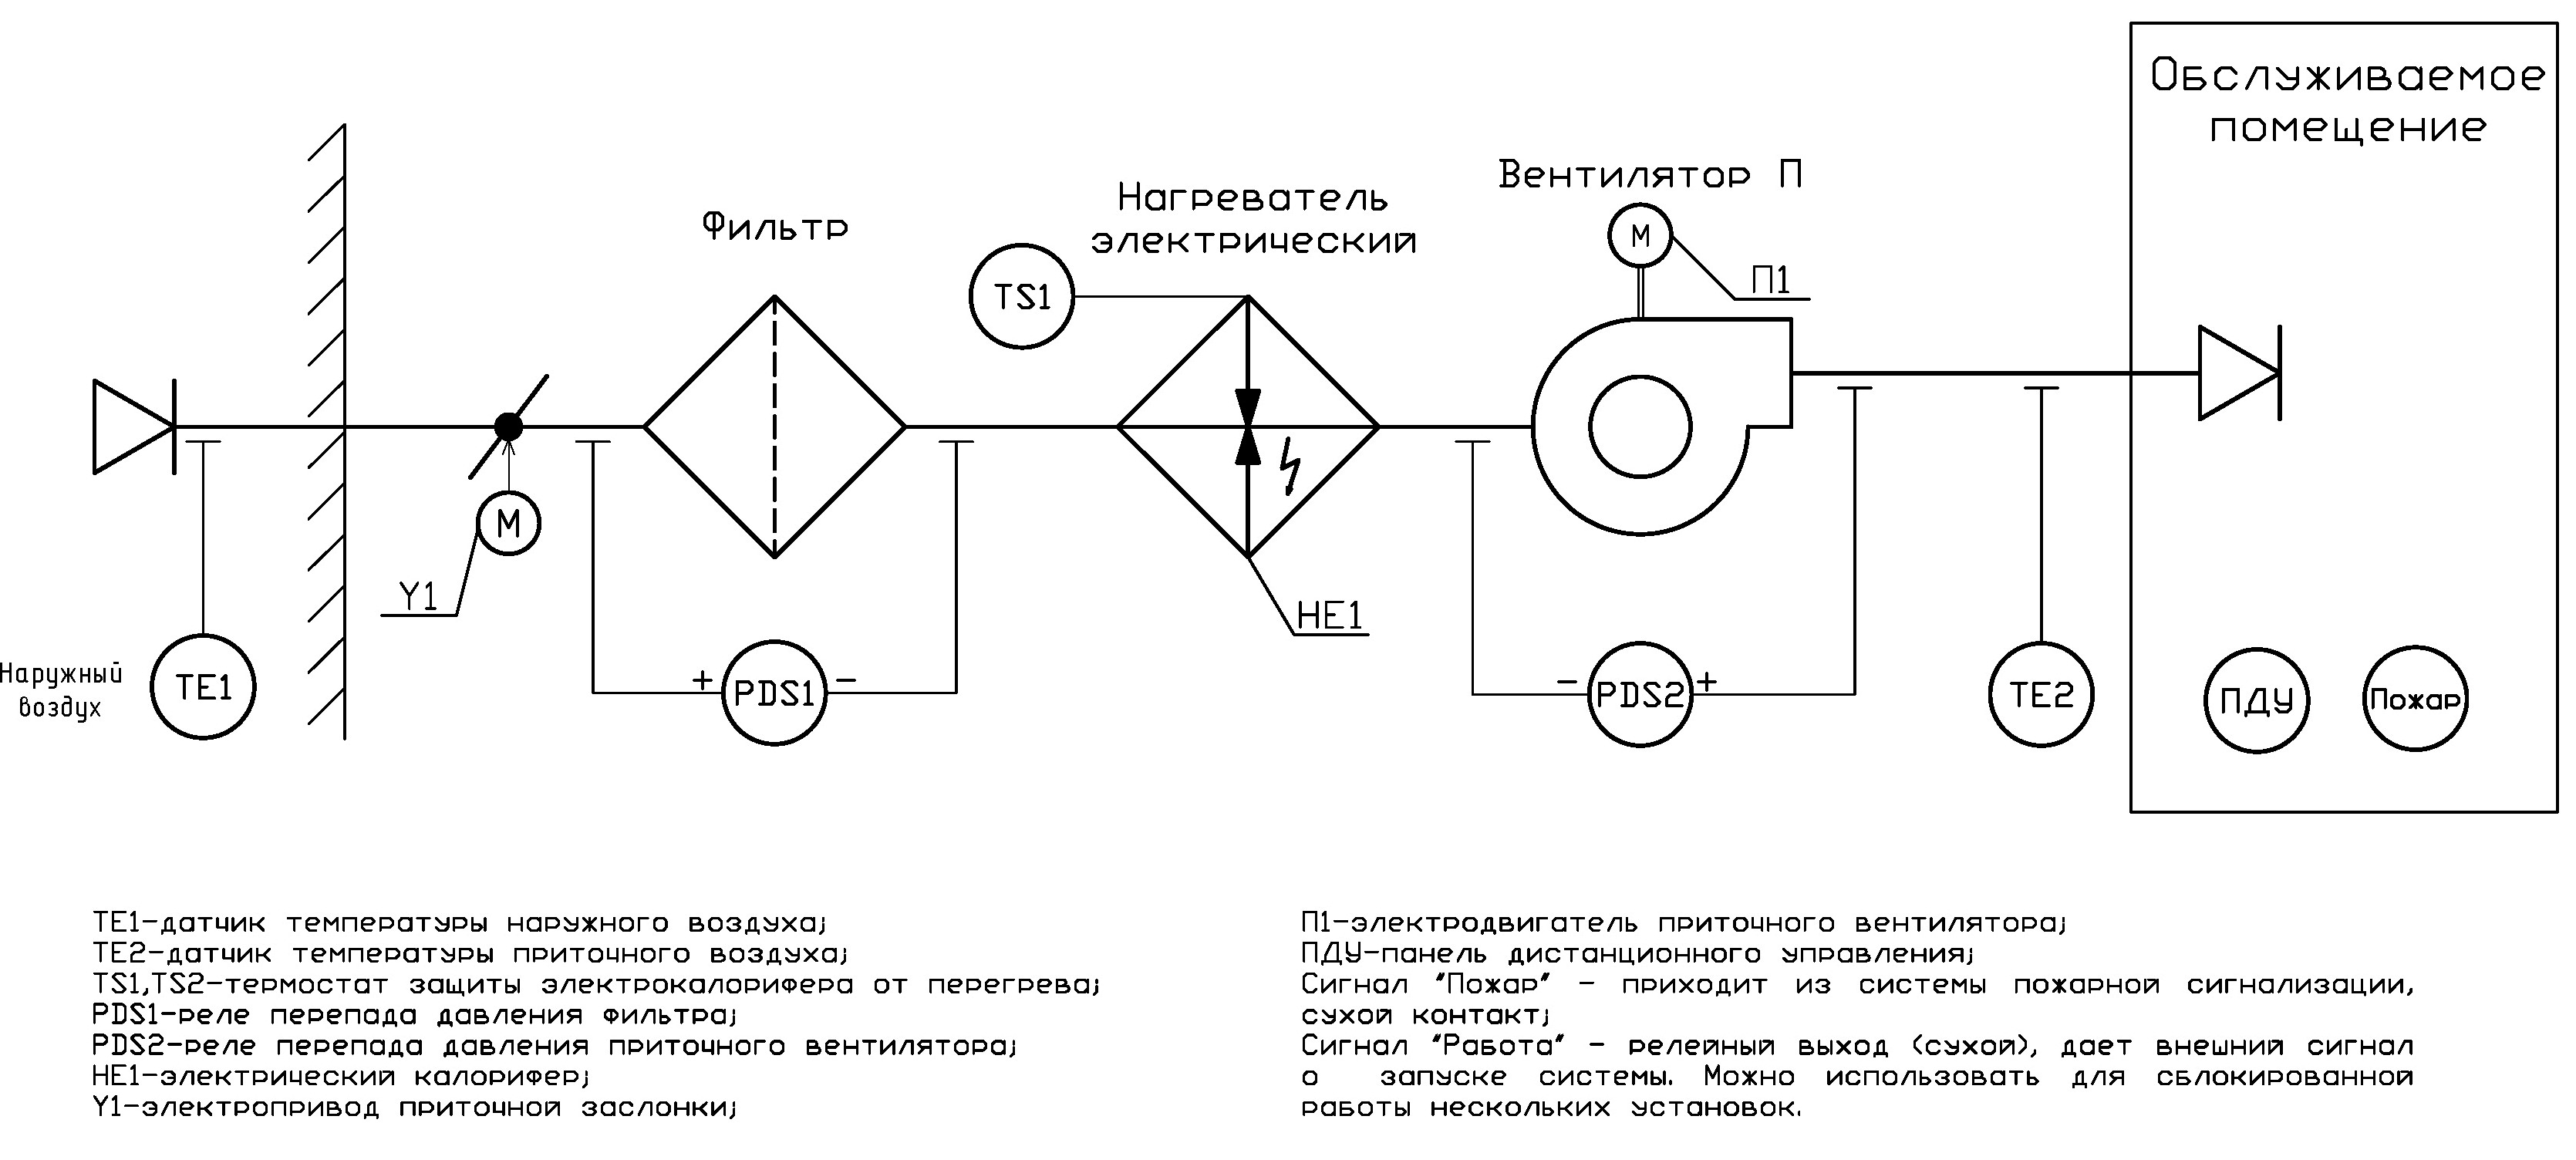 Схема щита приточной вентиляции фото 687